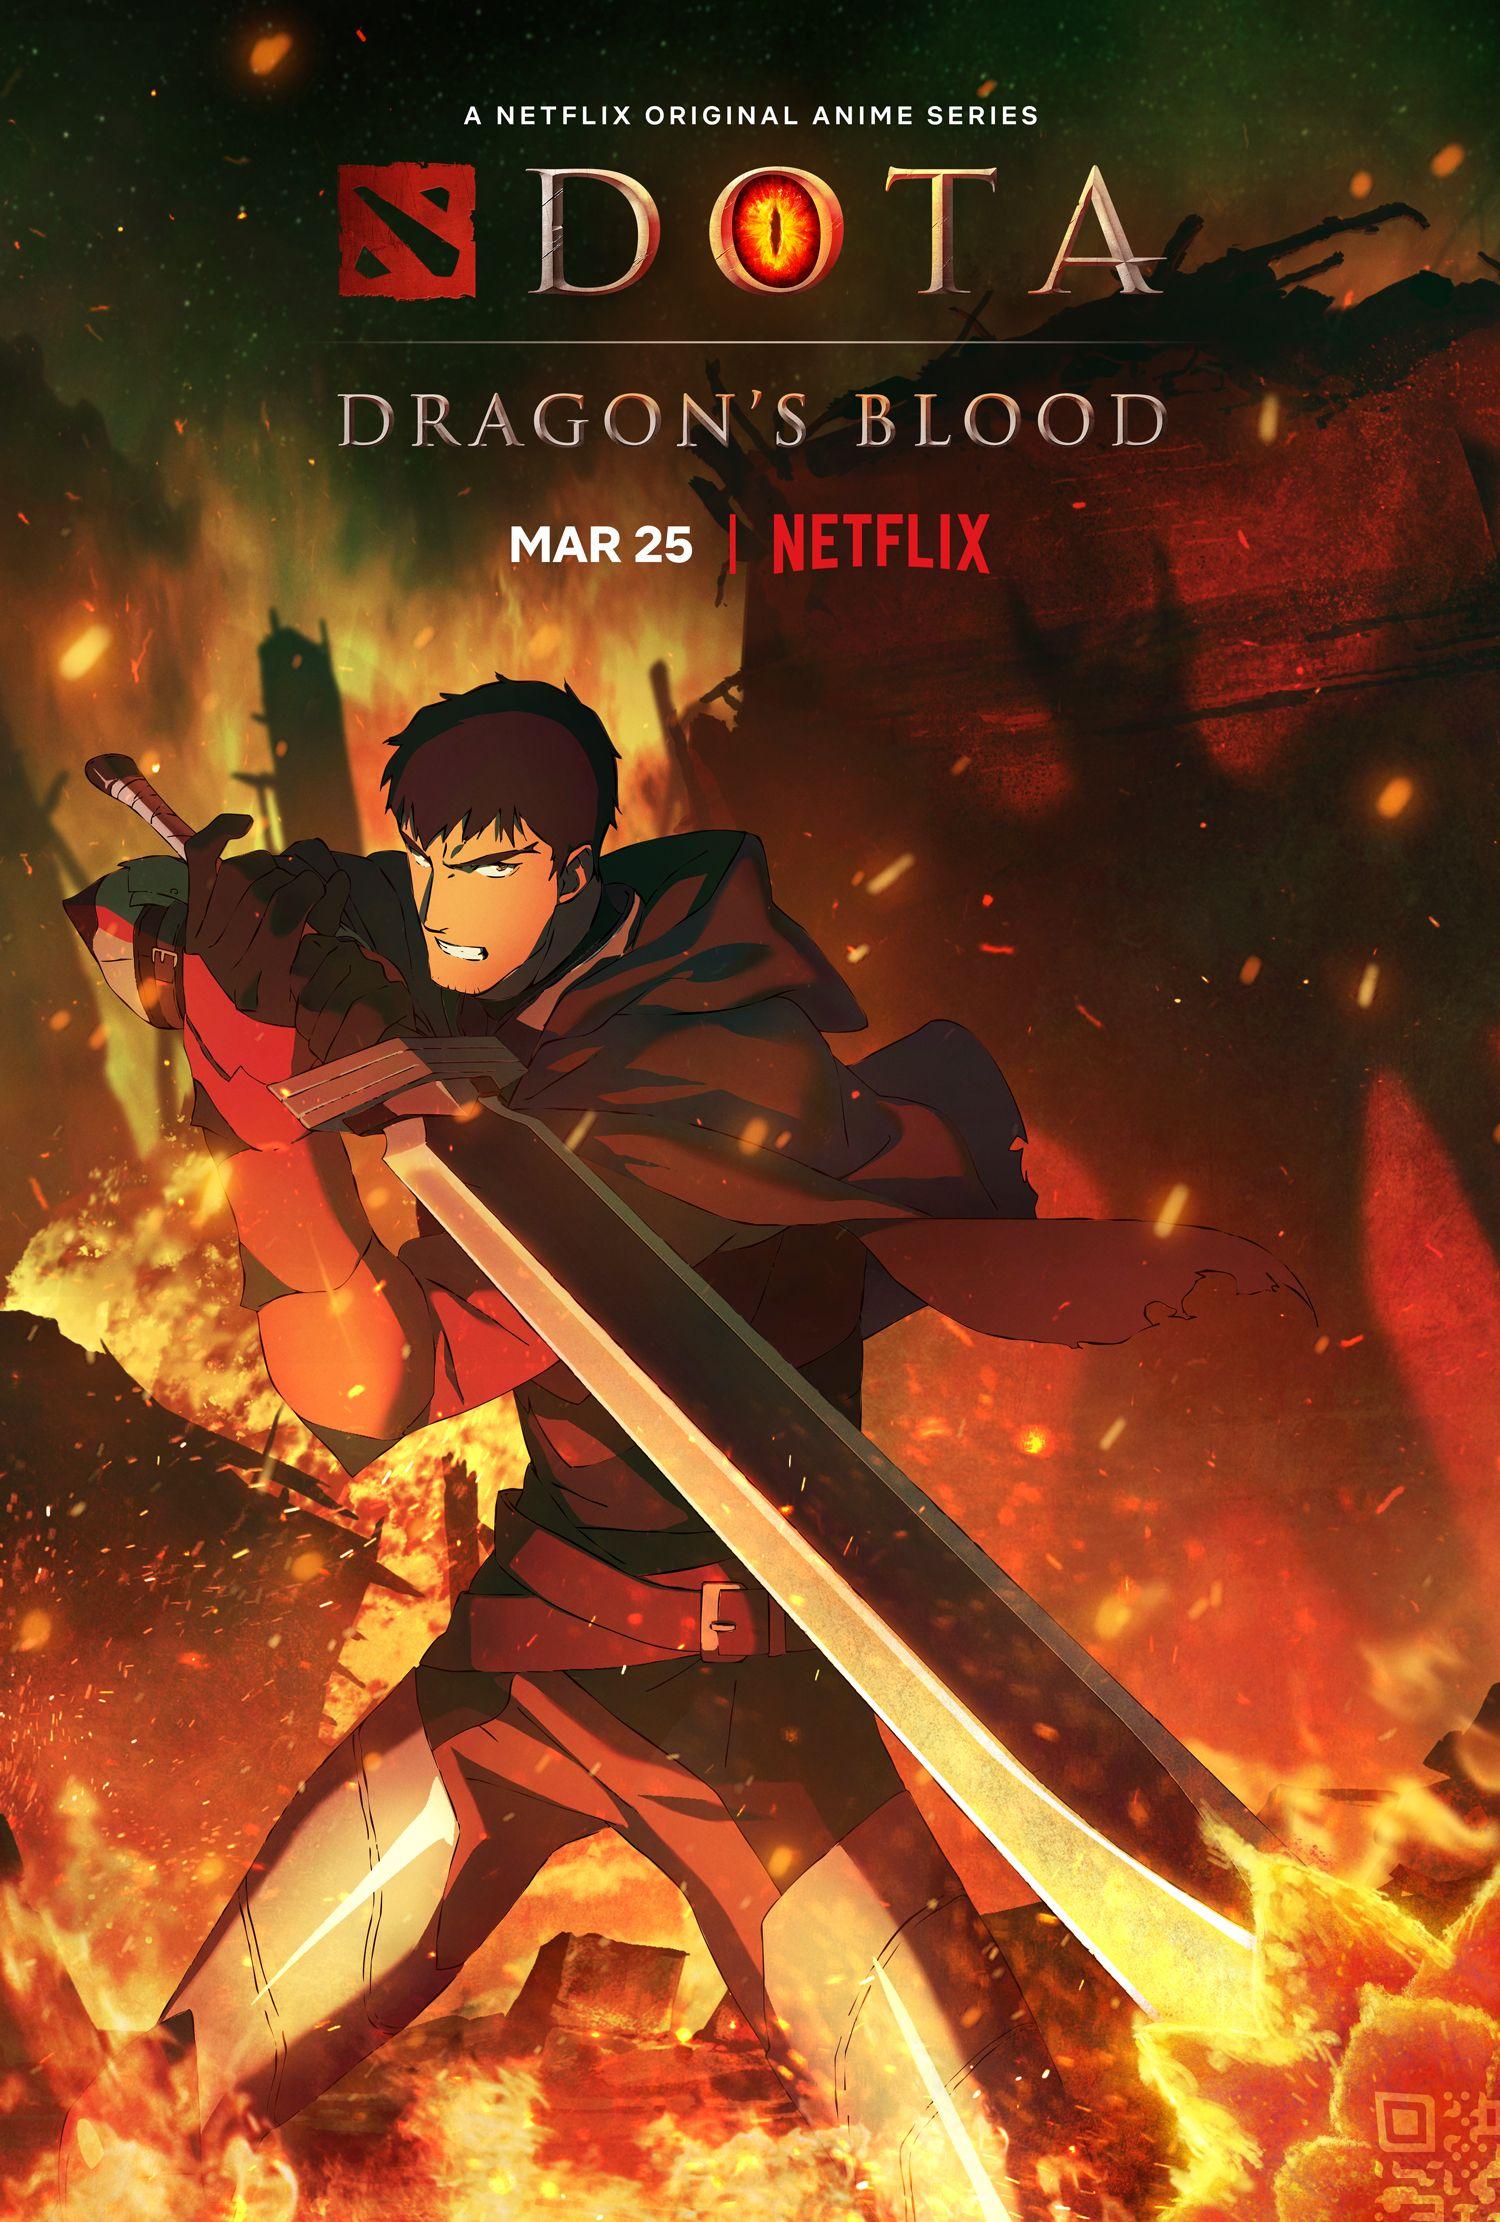 DOTA: Primeiro trailer e pôsteres de Dragon's Blood Drops para a série de anime do Netflix 1